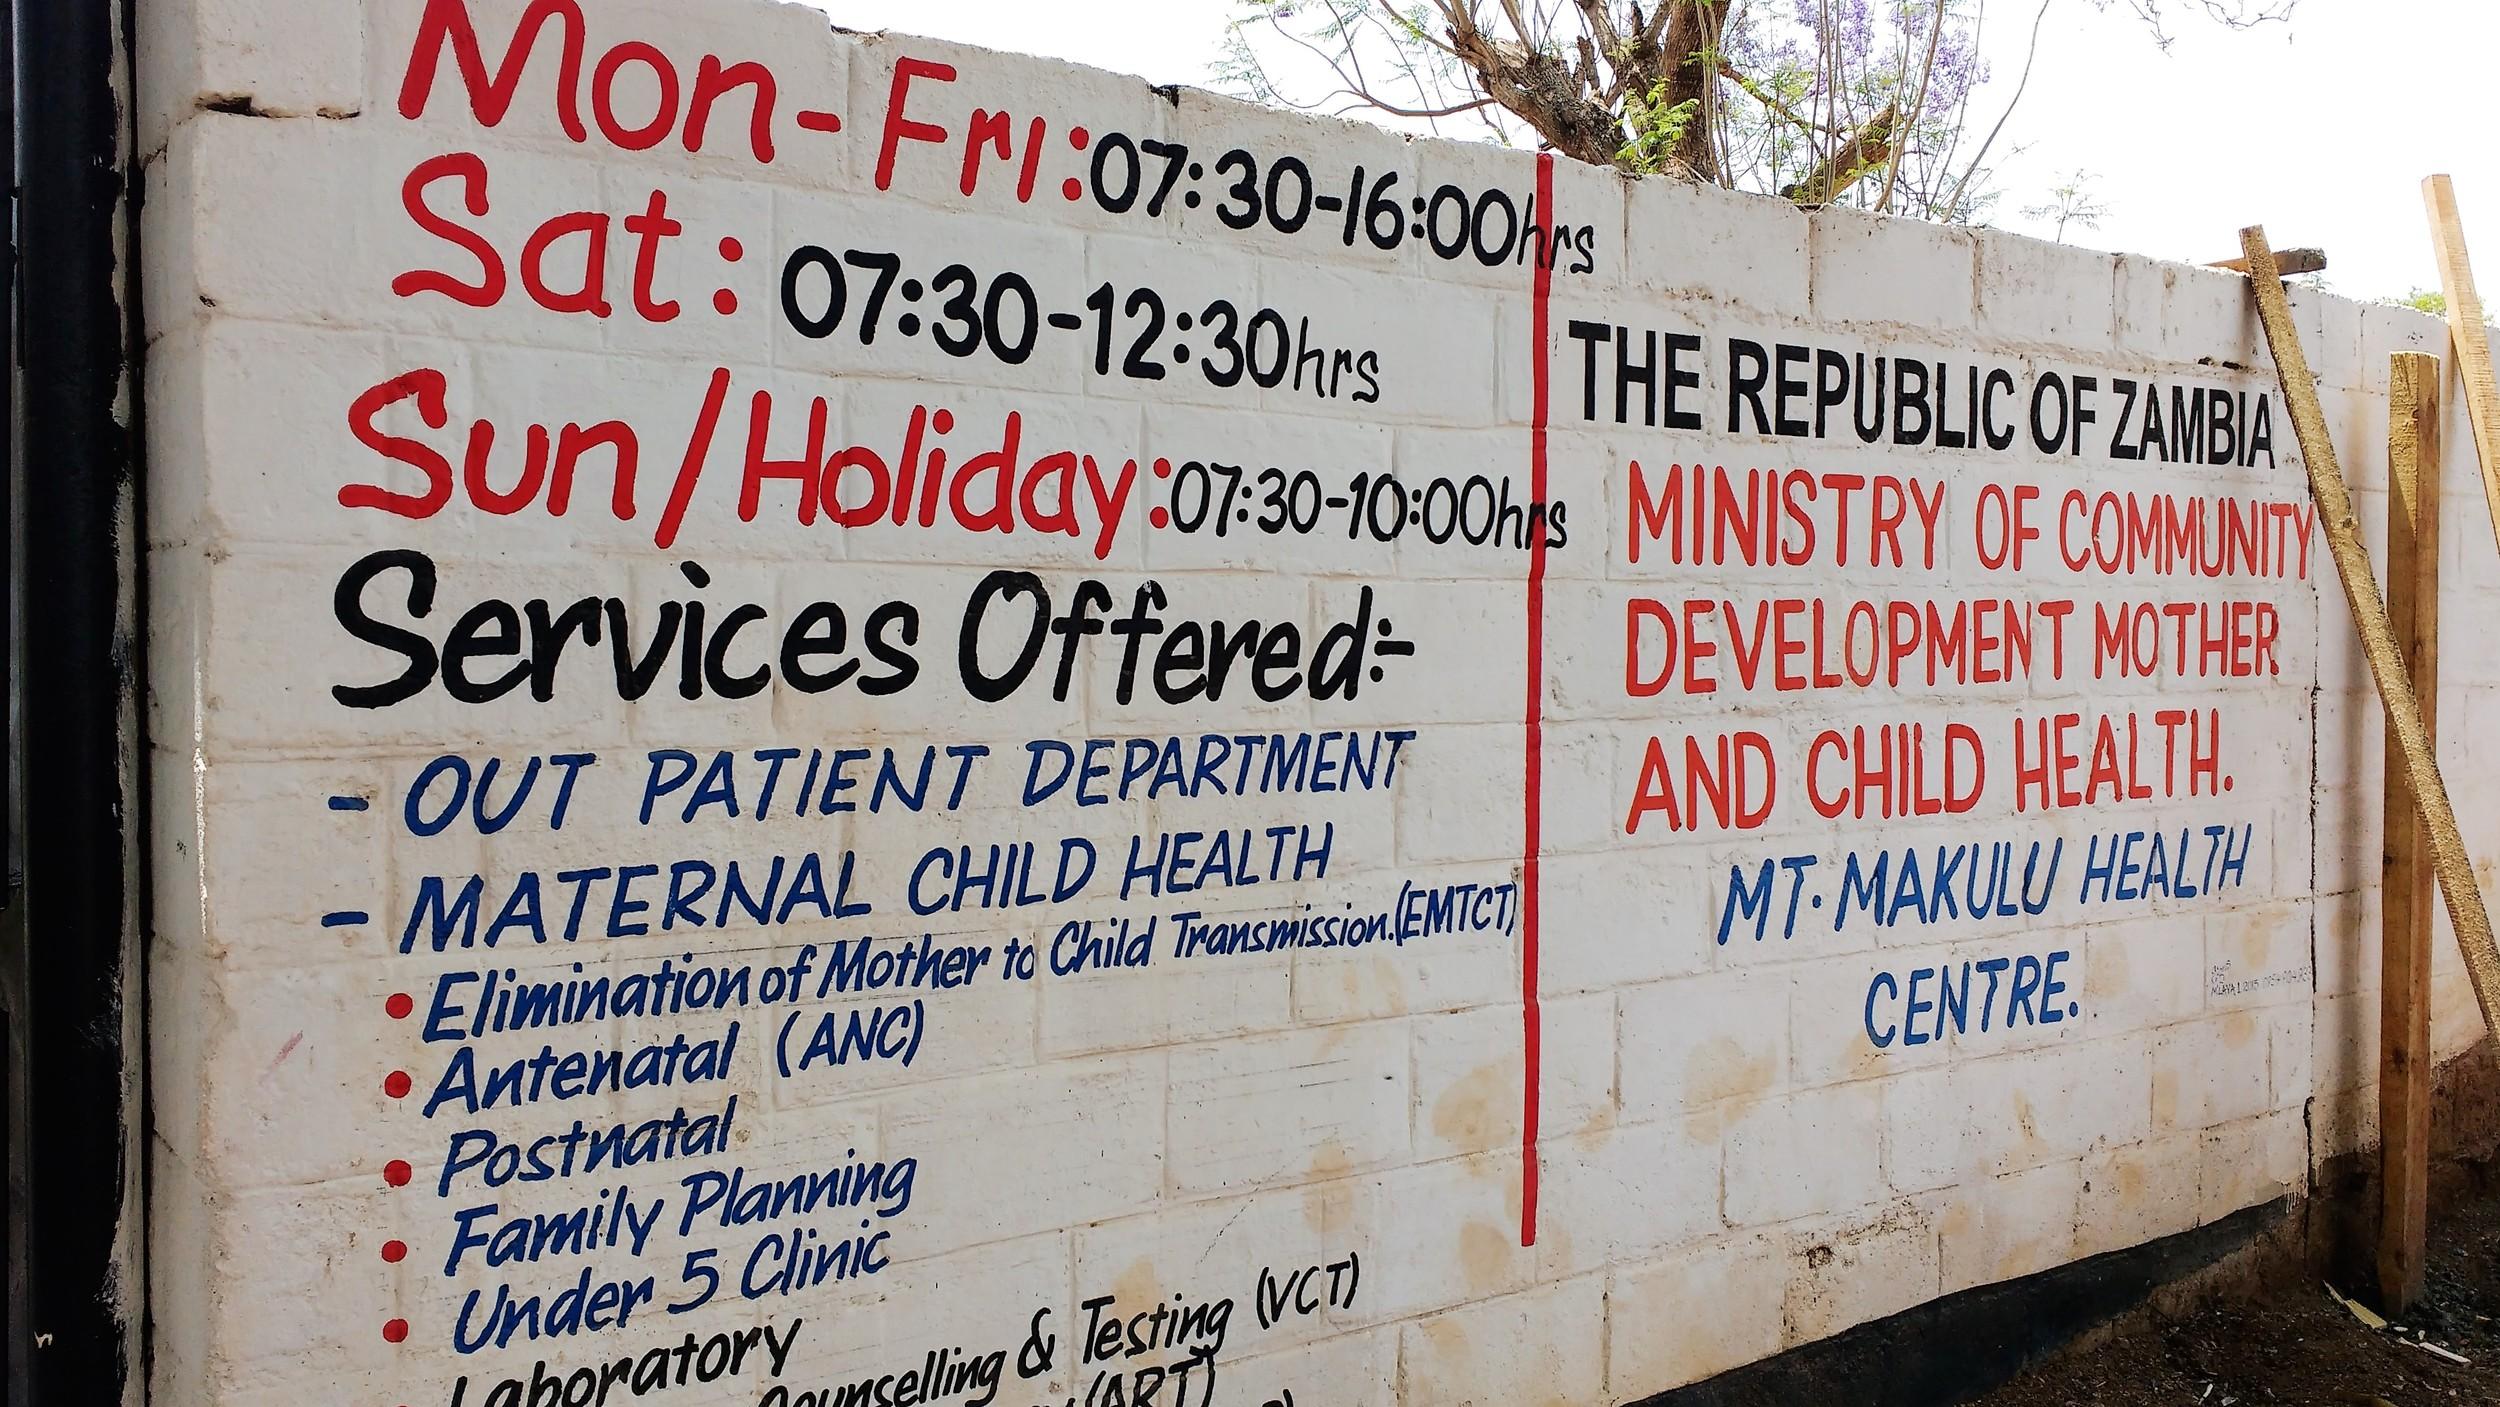 Mount Makulu Rural Health Centre, Chilanga, Zambia